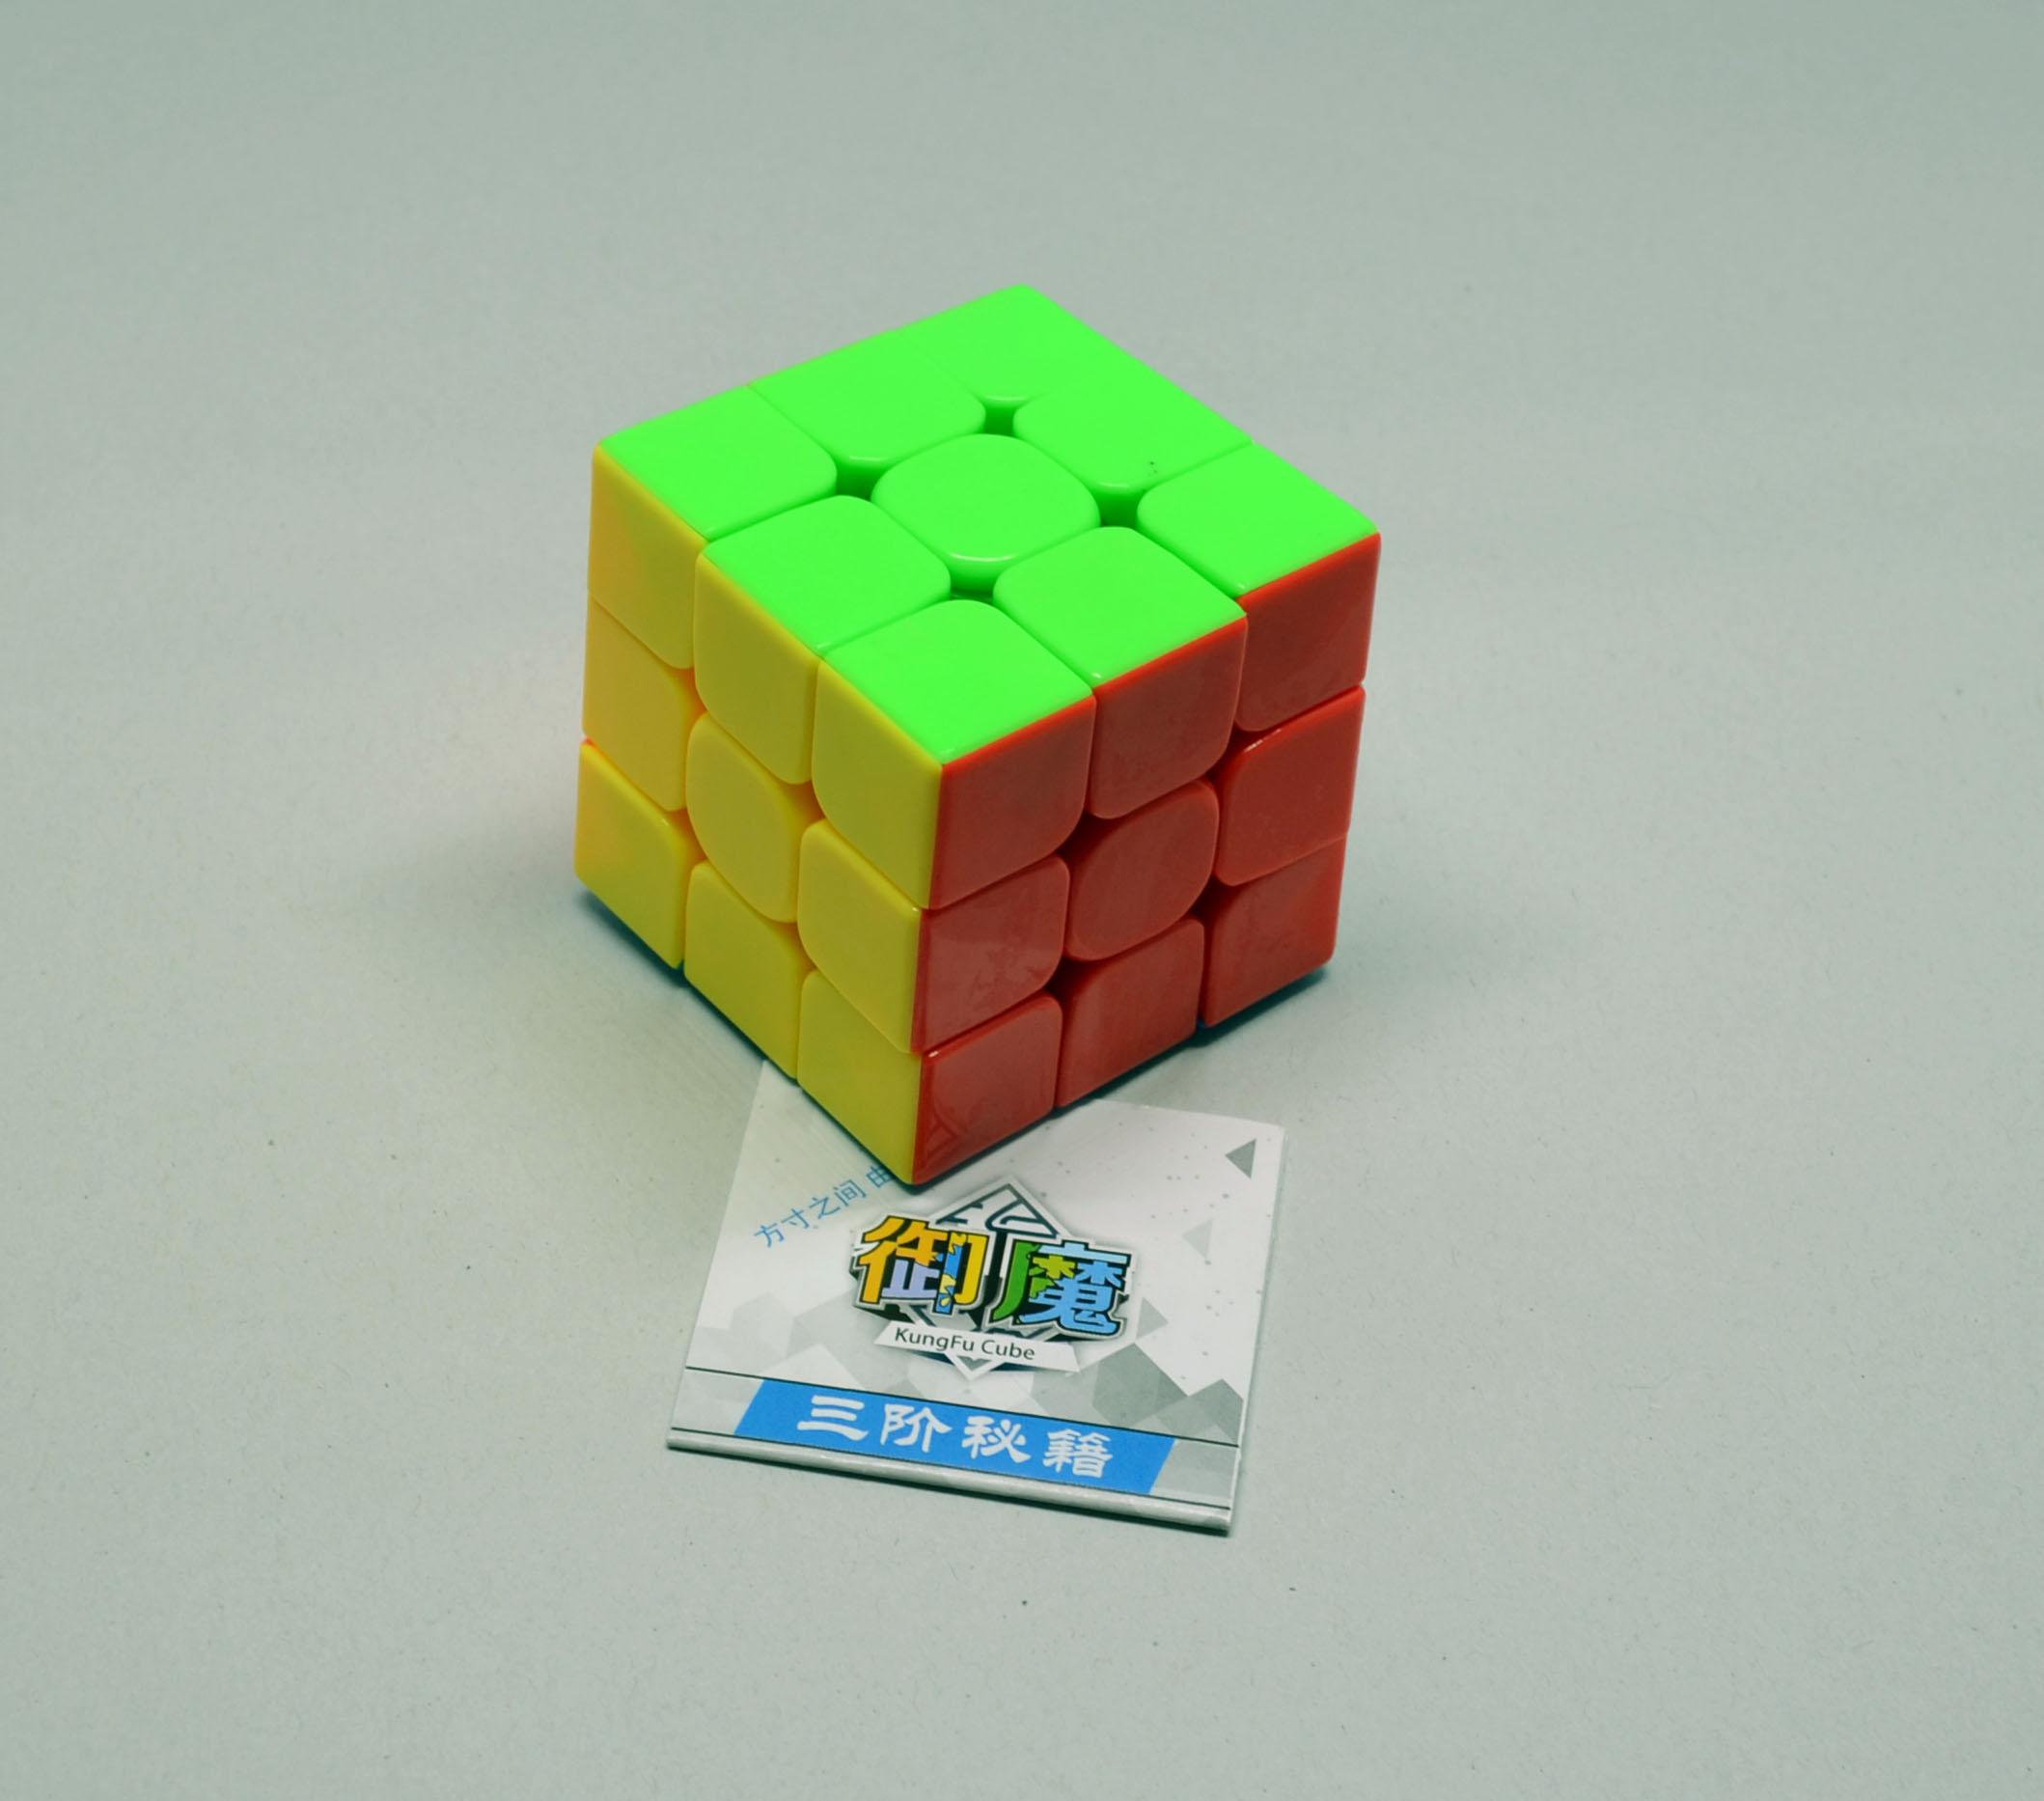 The 3x3x3.